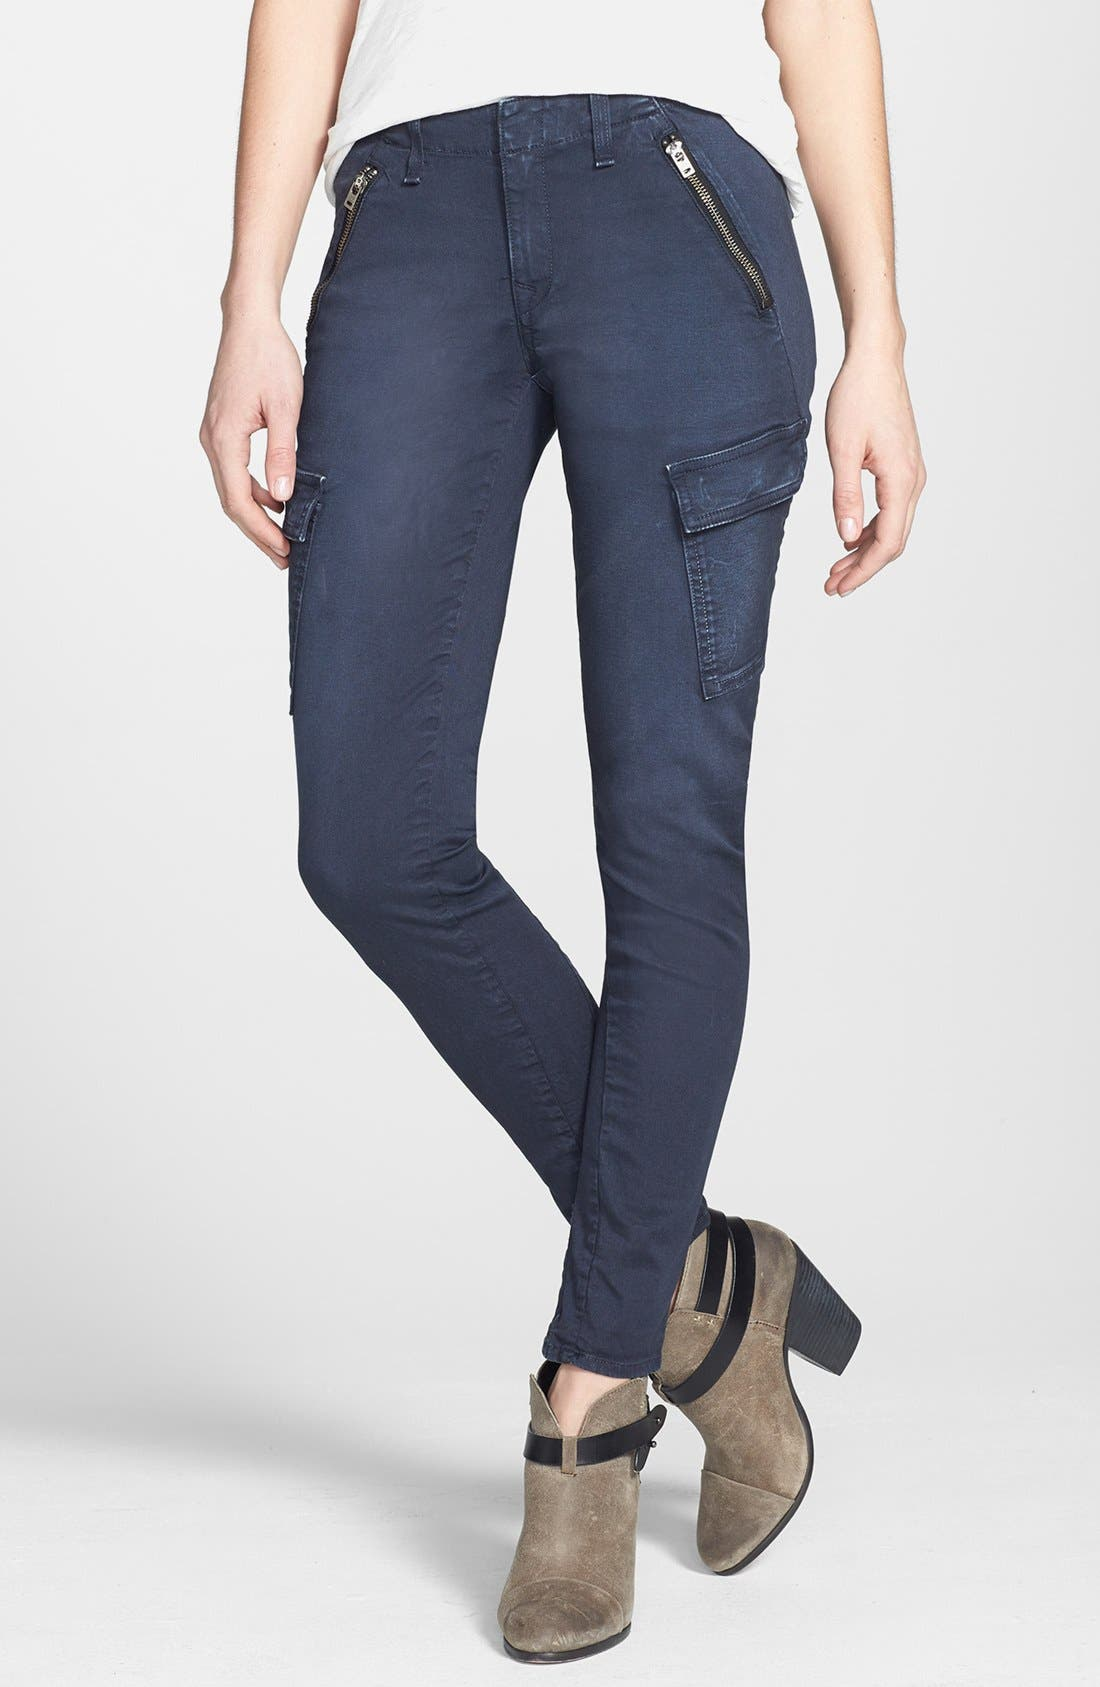 Main Image - rag & bone/JEAN 'Bowery' Cargo Skinny Jeans (Distressed Navy)